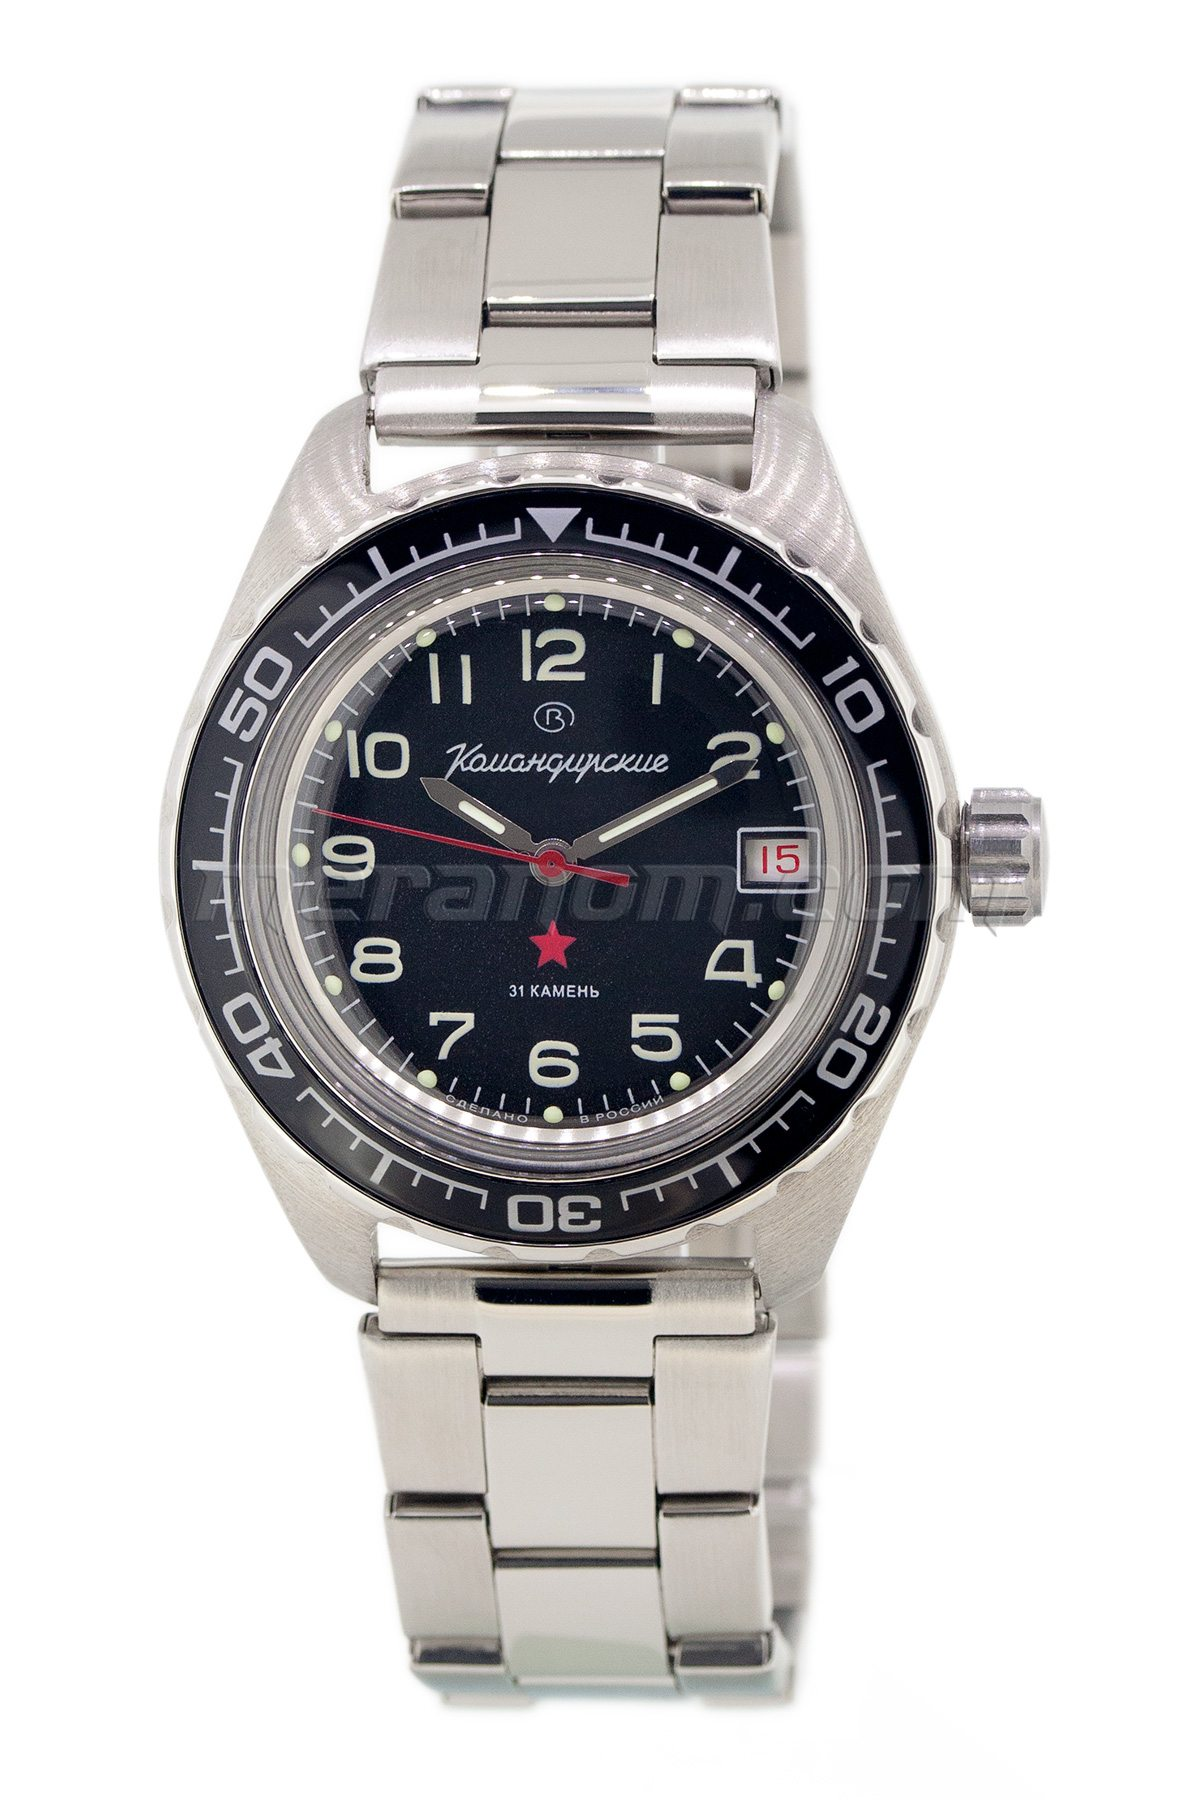 Vostok watch komandirskie 020706 buy from an authorized dealer for Komandirskie watches